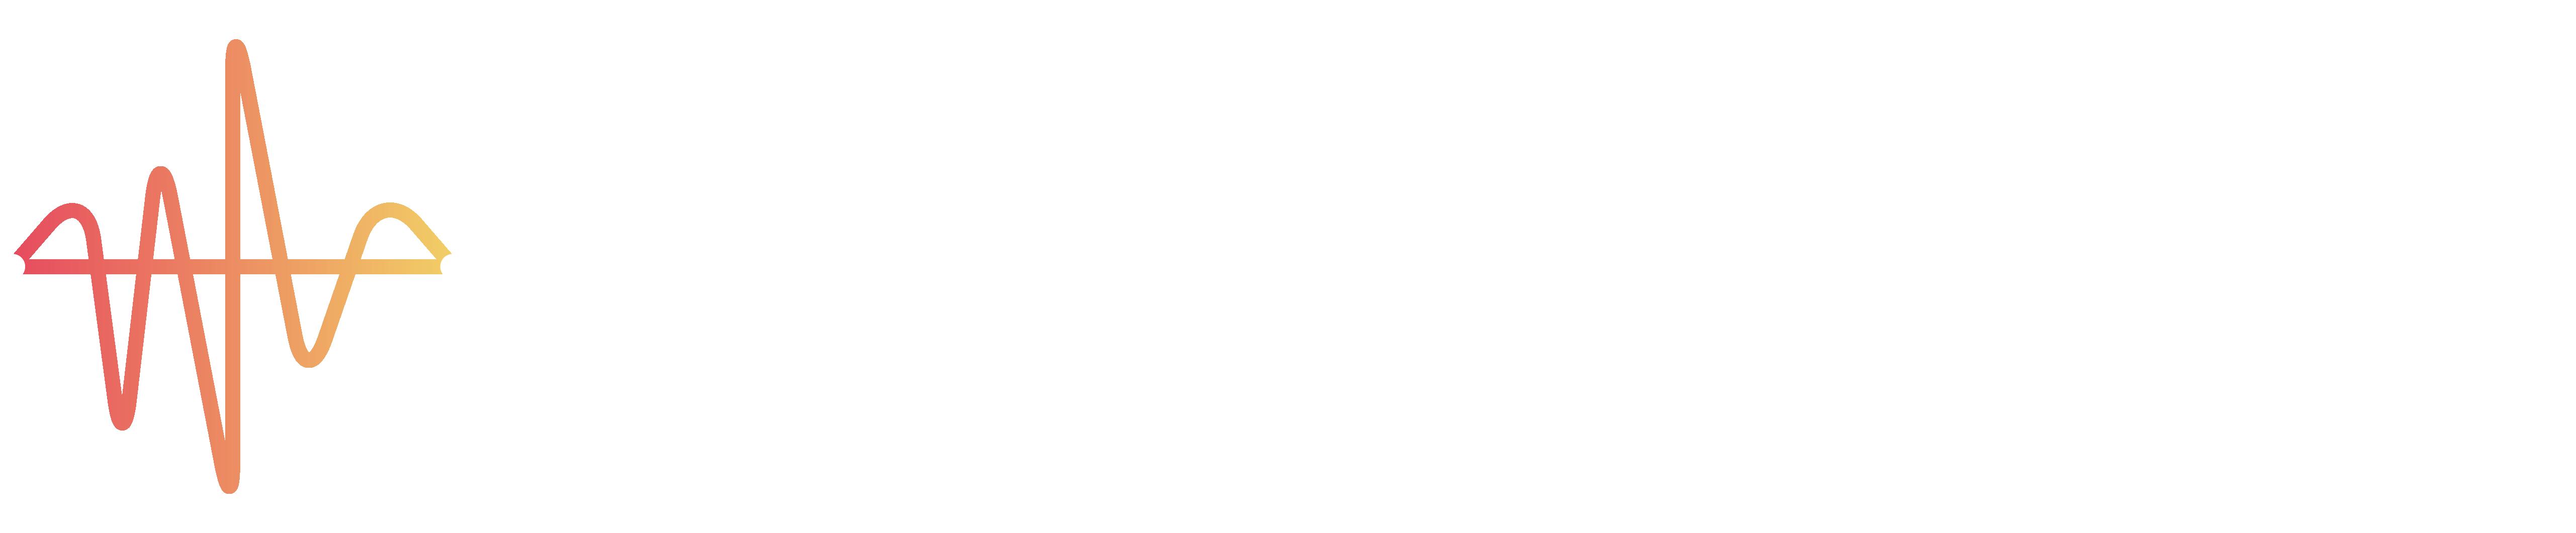 foodservice__logo-trans-png.png